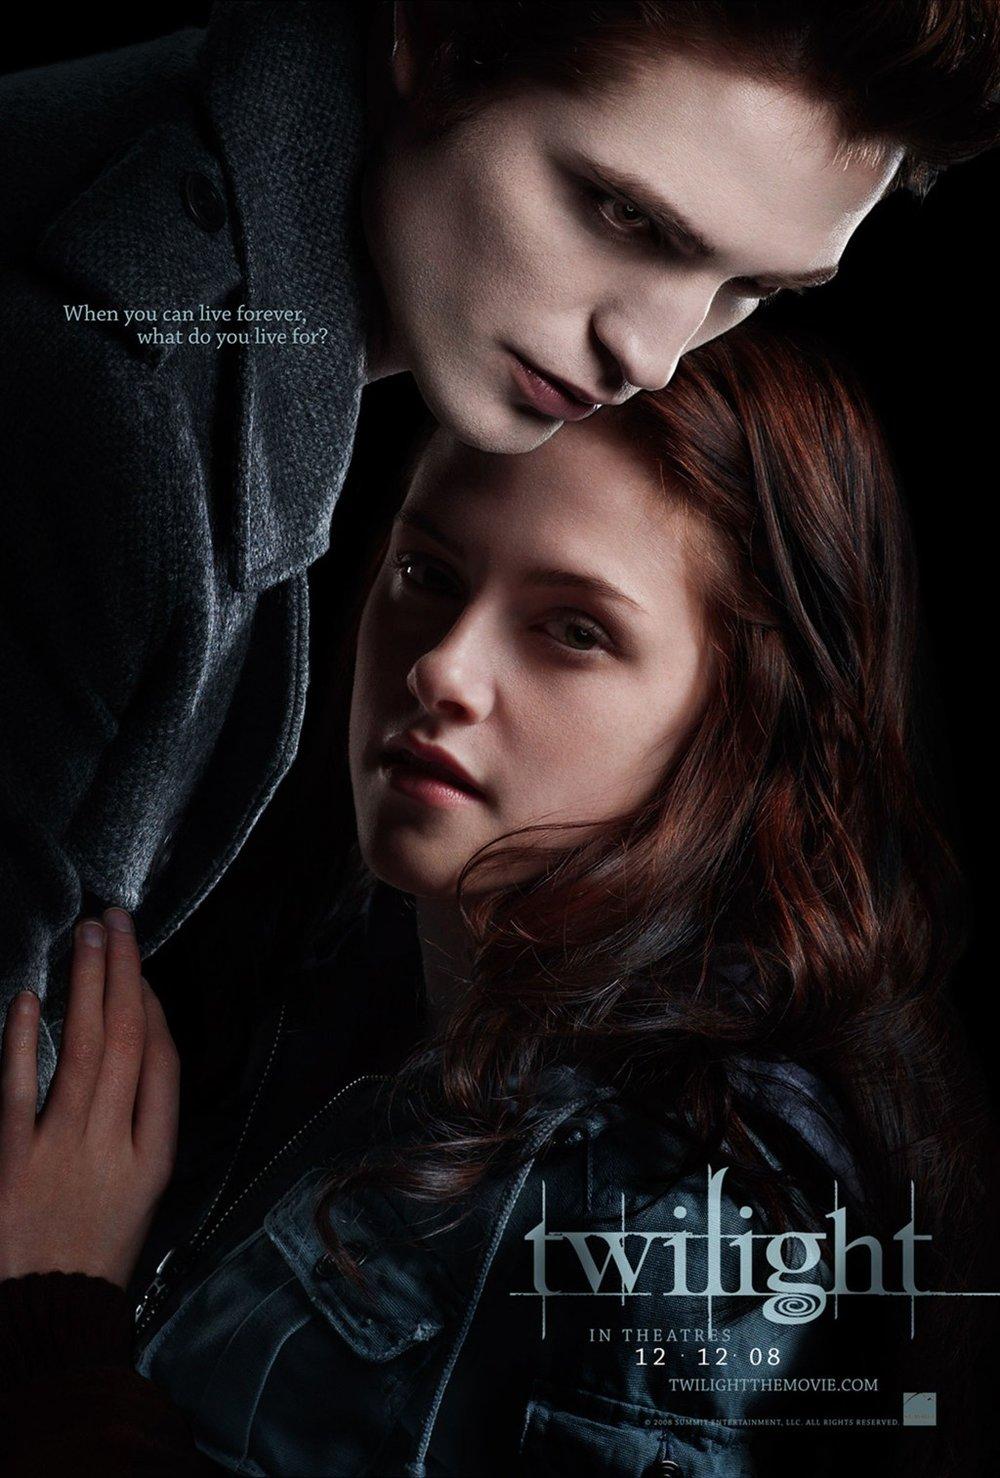 Joey_L_Photographer_Twilight_Movie_Poster.jpg